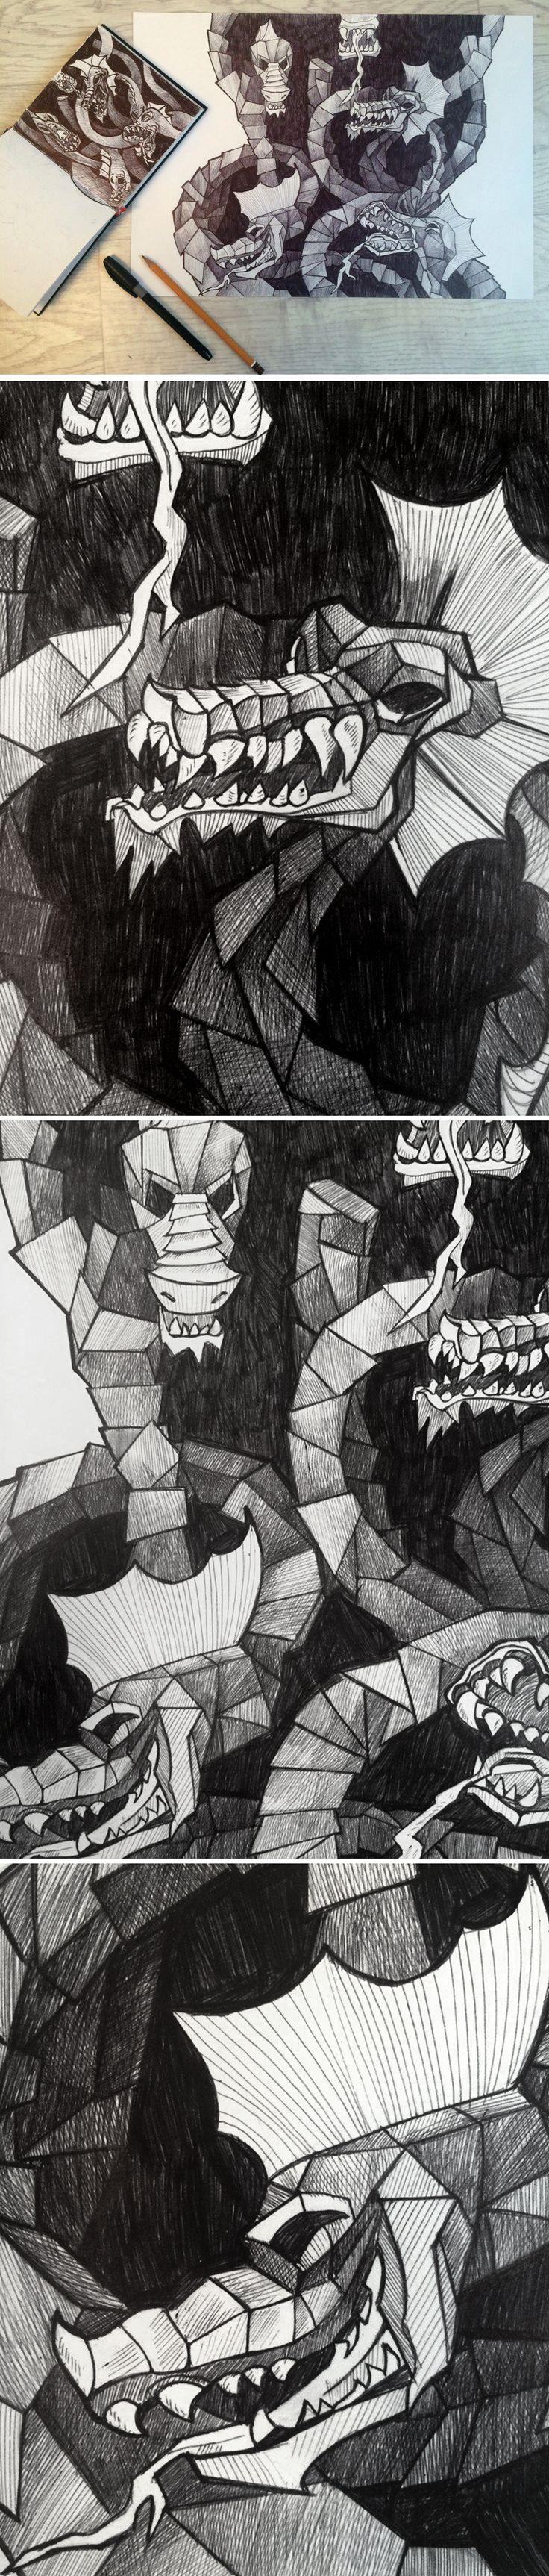 Графика на тему подвигов Геракла, подвиг 2 - убийство Лернейской гидры. Гелевая ручка. The graphics on the theme of the labors of Hercules , a feat 2 - Kill Lernaean hydra . #art #graphics #hydra #myth #drawing